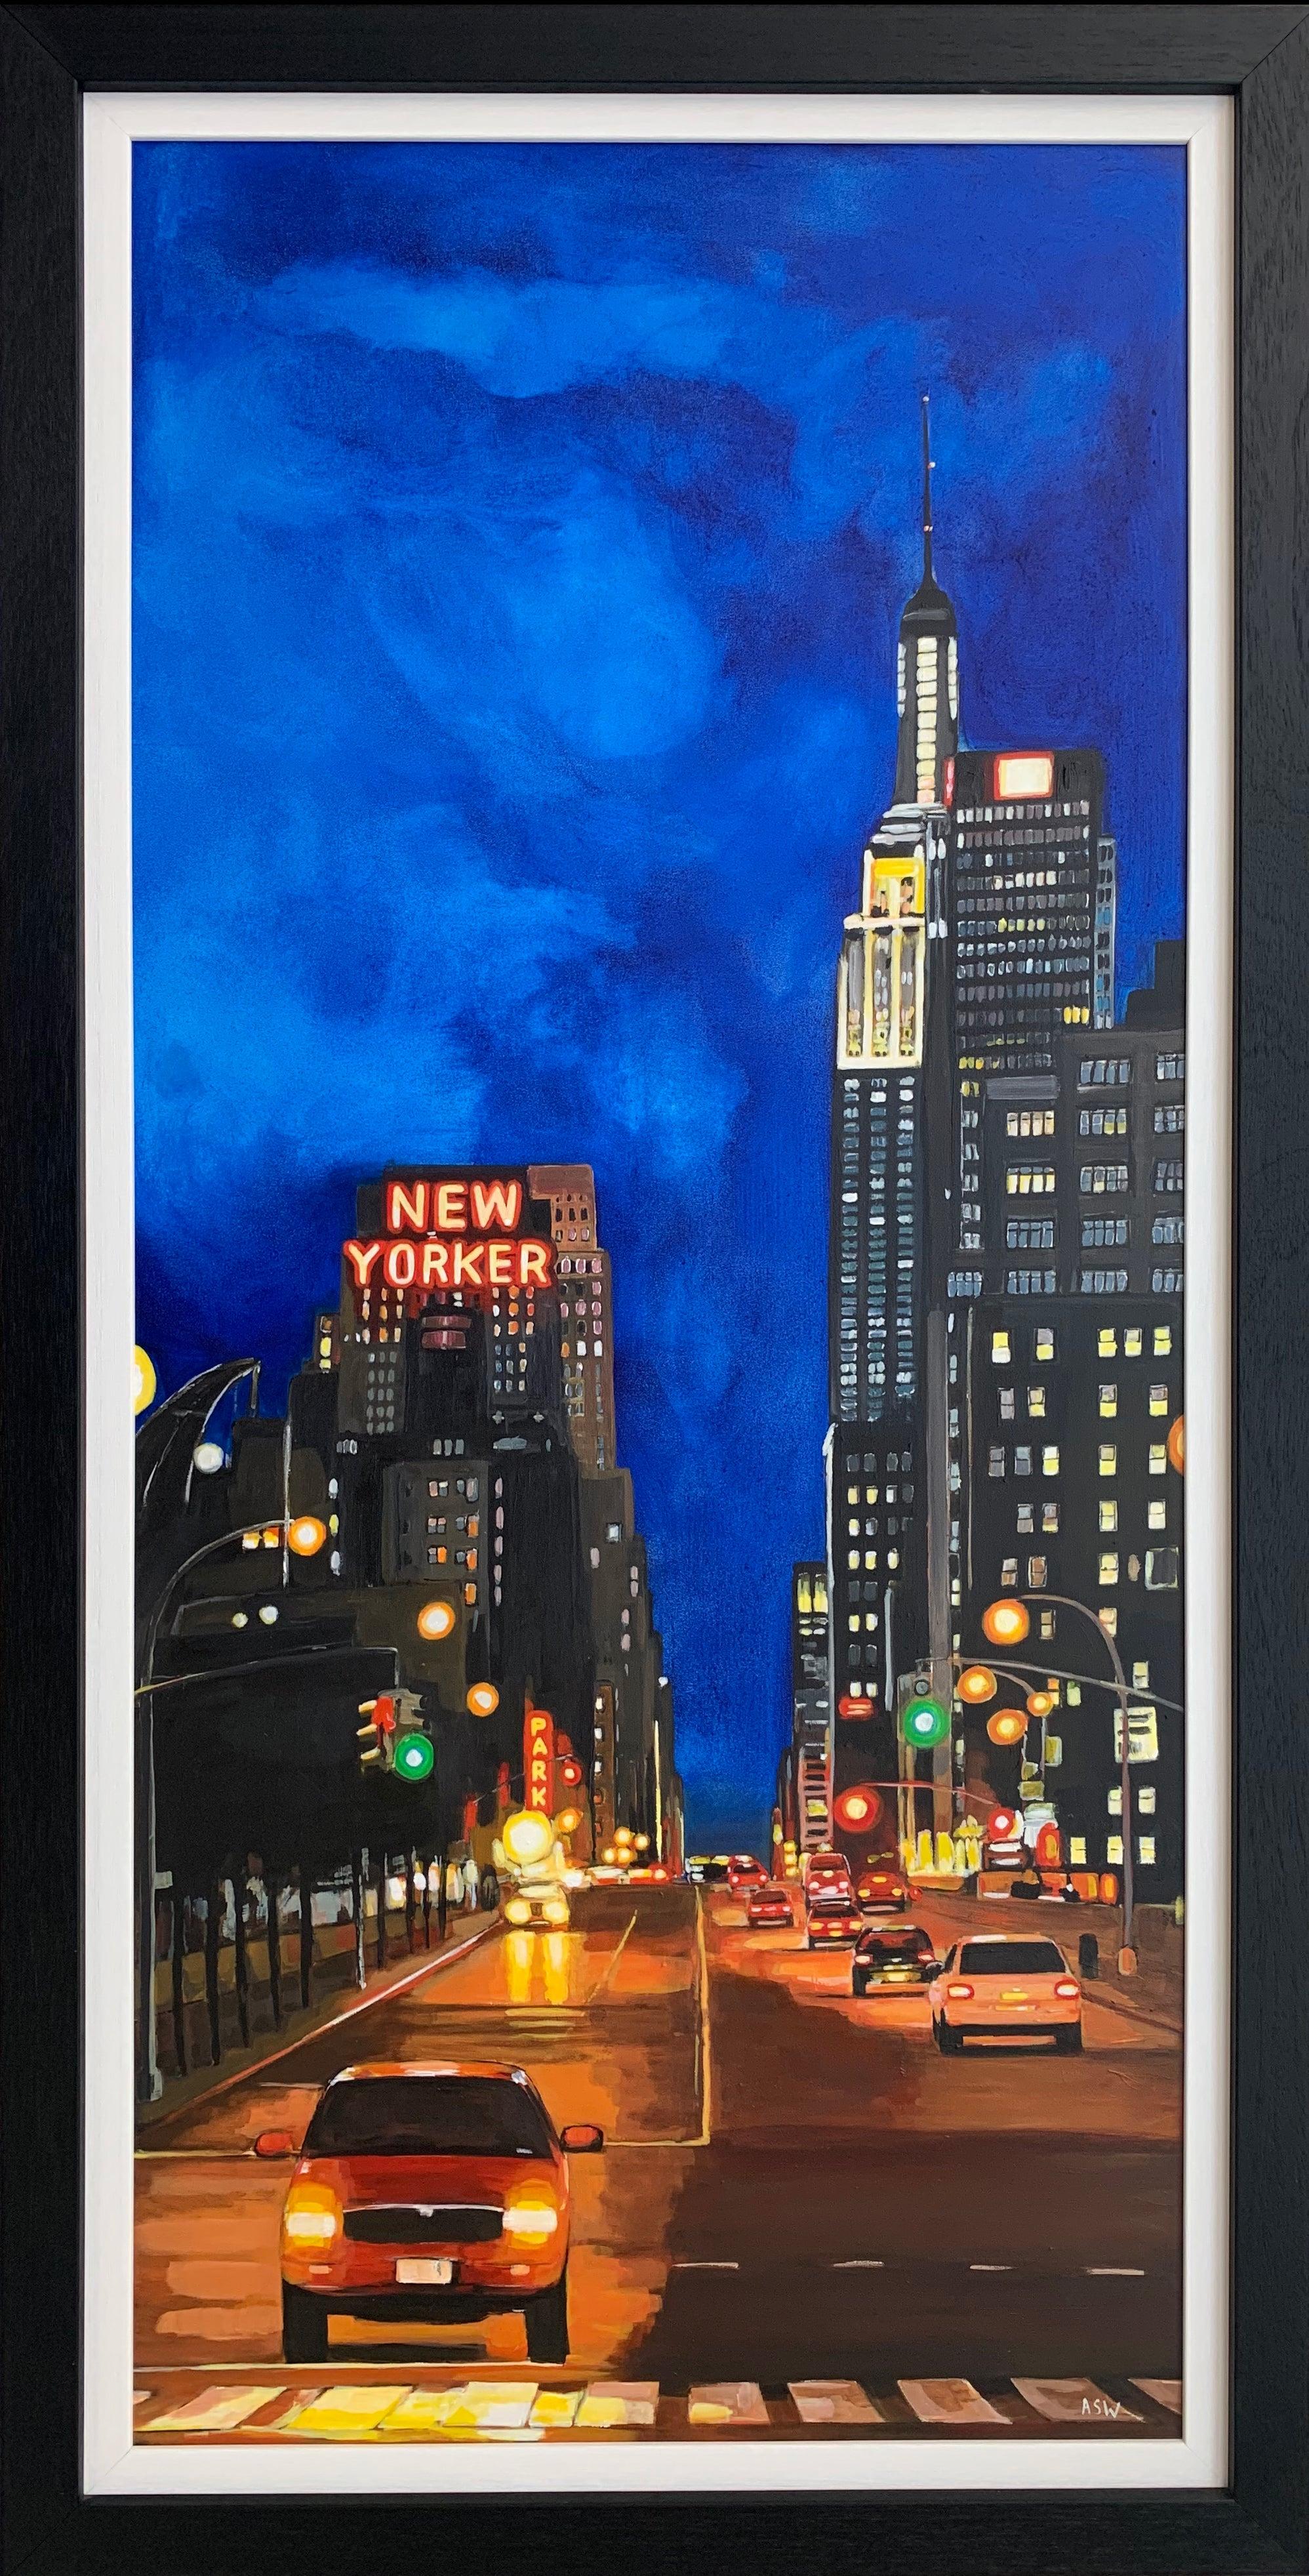 The New Yorker Hotel 8th Avenue Manhattan New York City by British Urban Artist